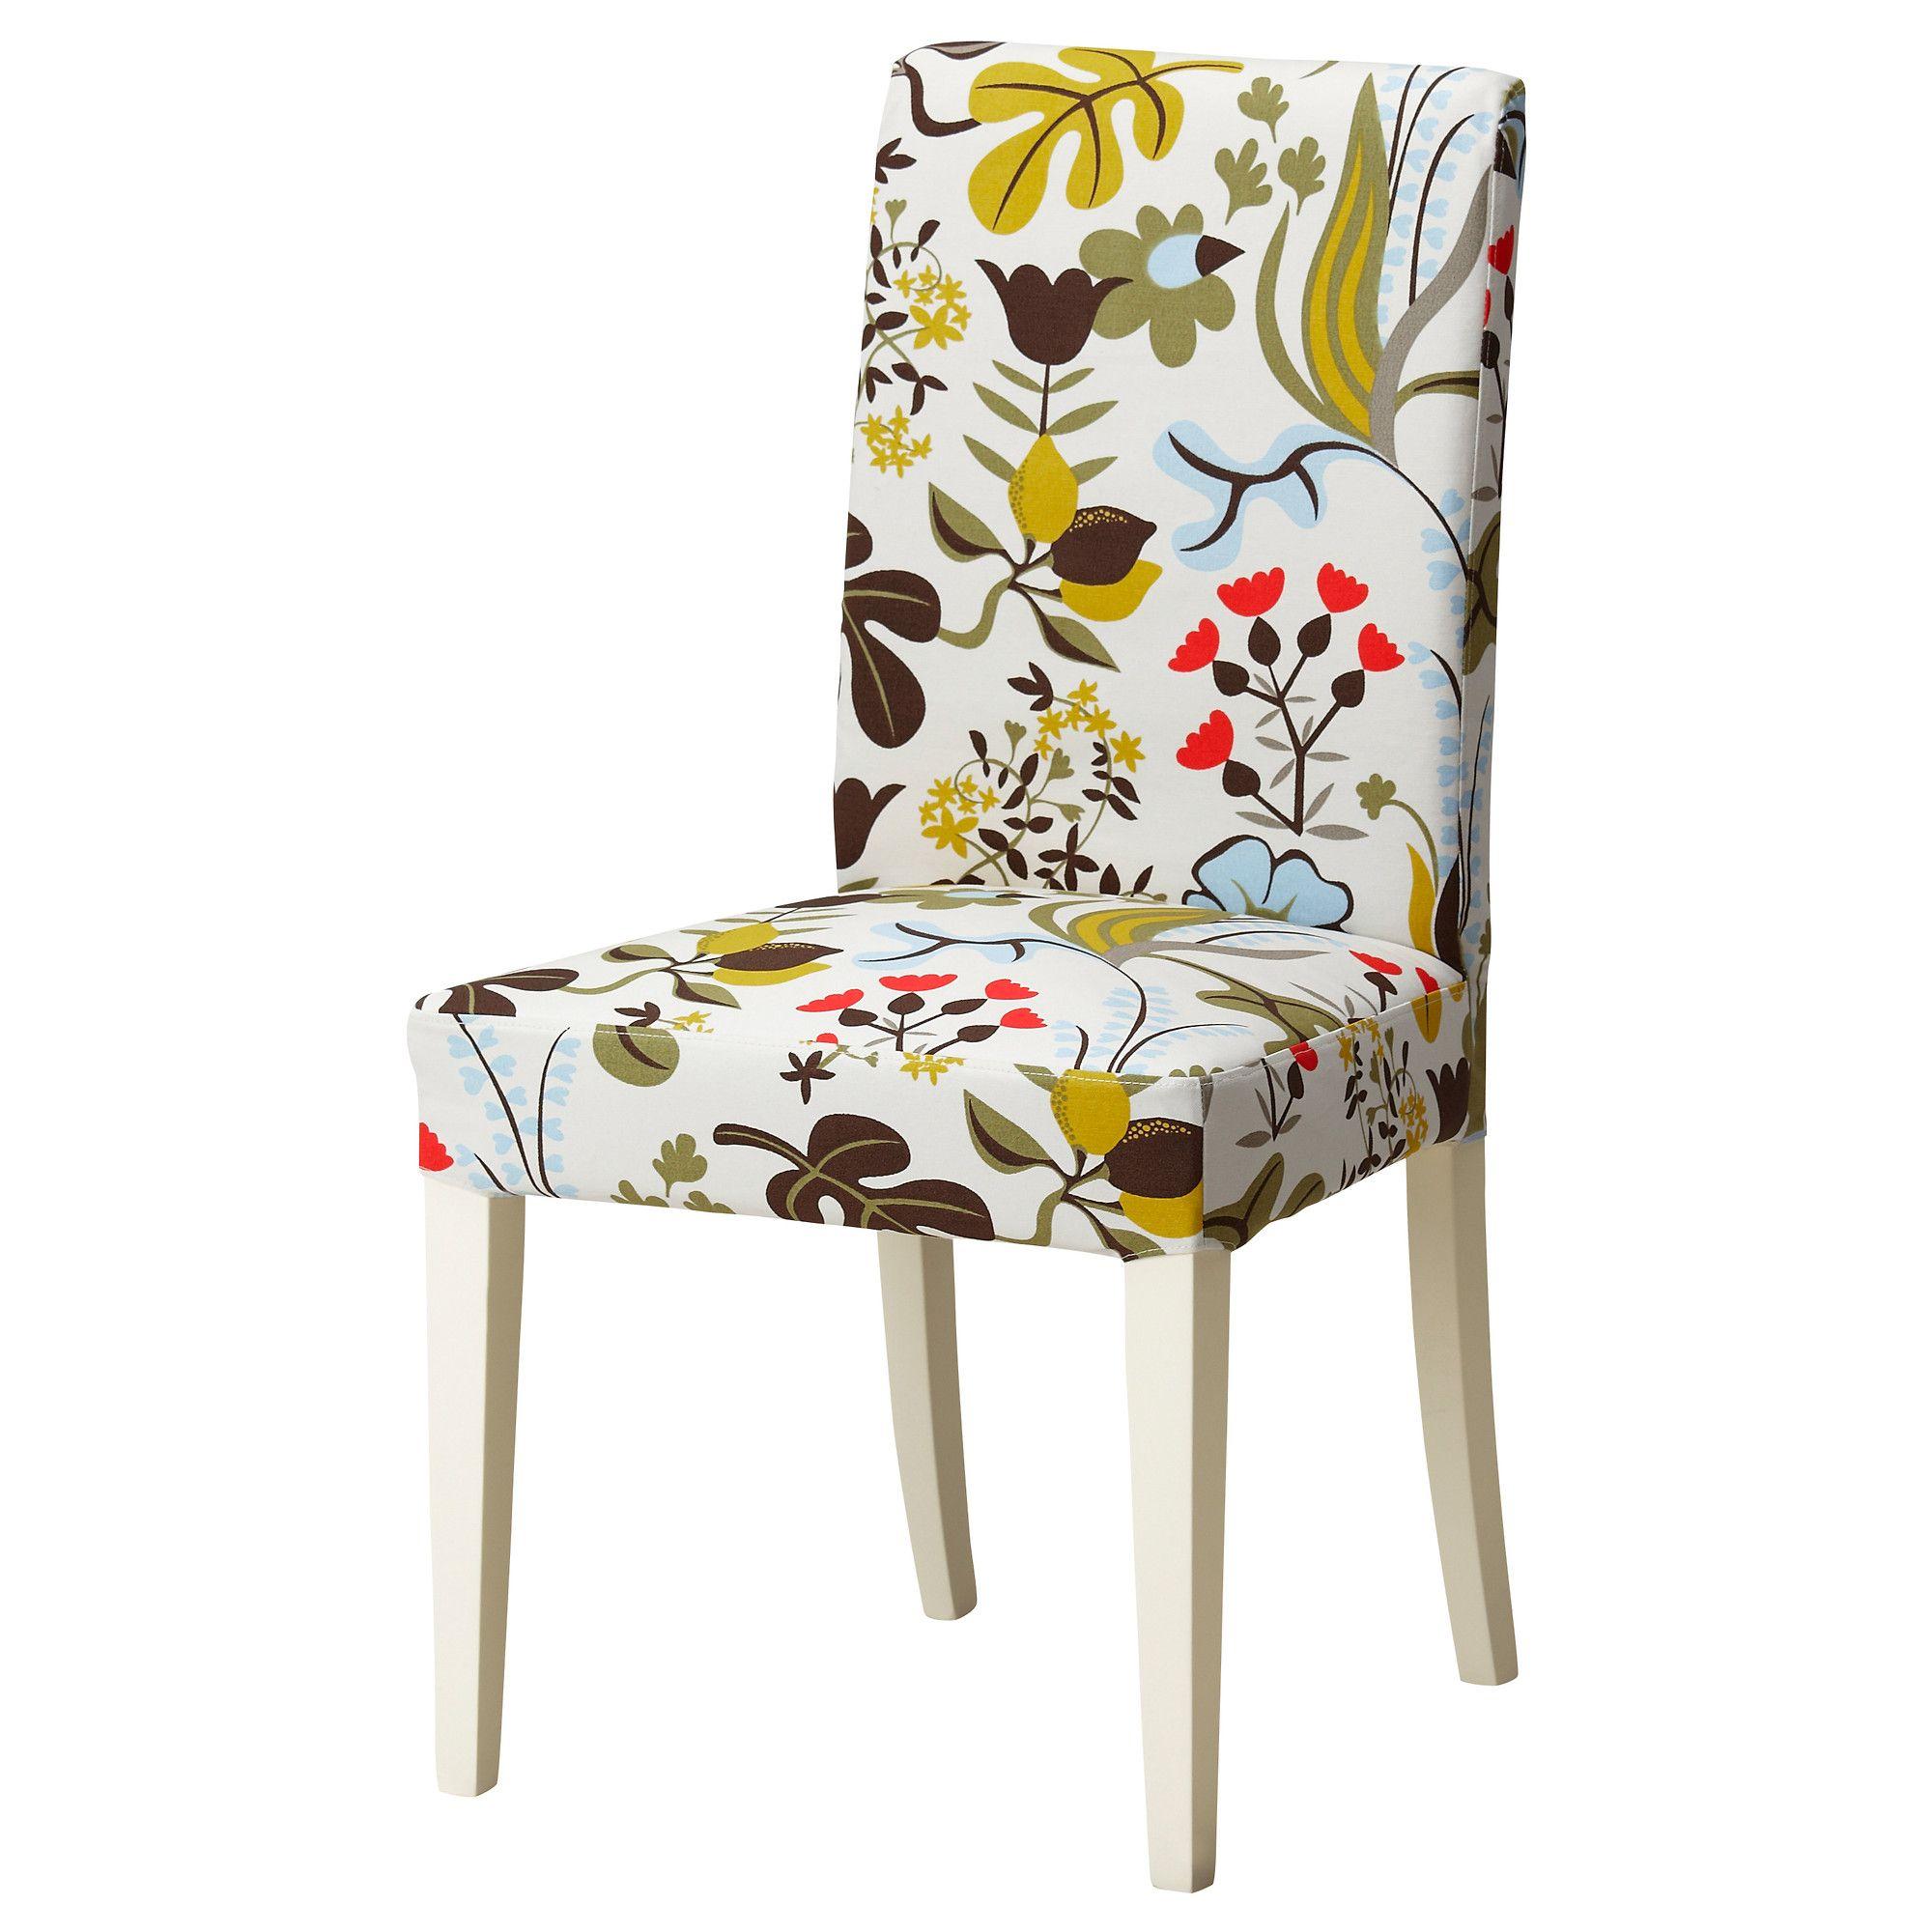 henriksdal chaise blomsterm la multicolore ikea living room pinterest d co. Black Bedroom Furniture Sets. Home Design Ideas